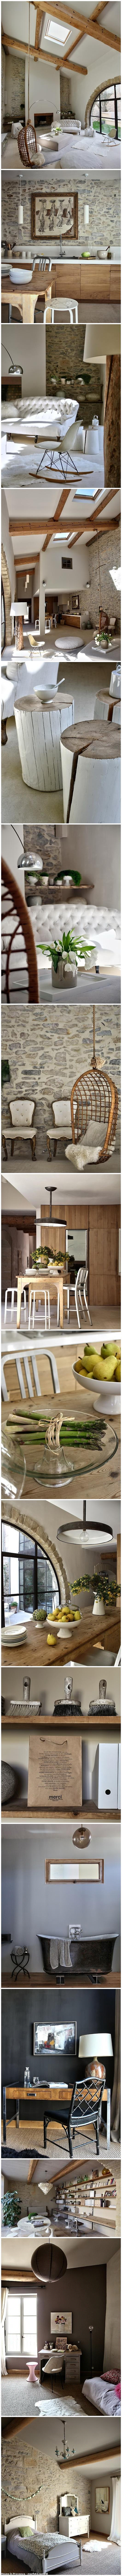 Scandia-Hus | The Chiddingstone | Timber Frame chalet design | house ...